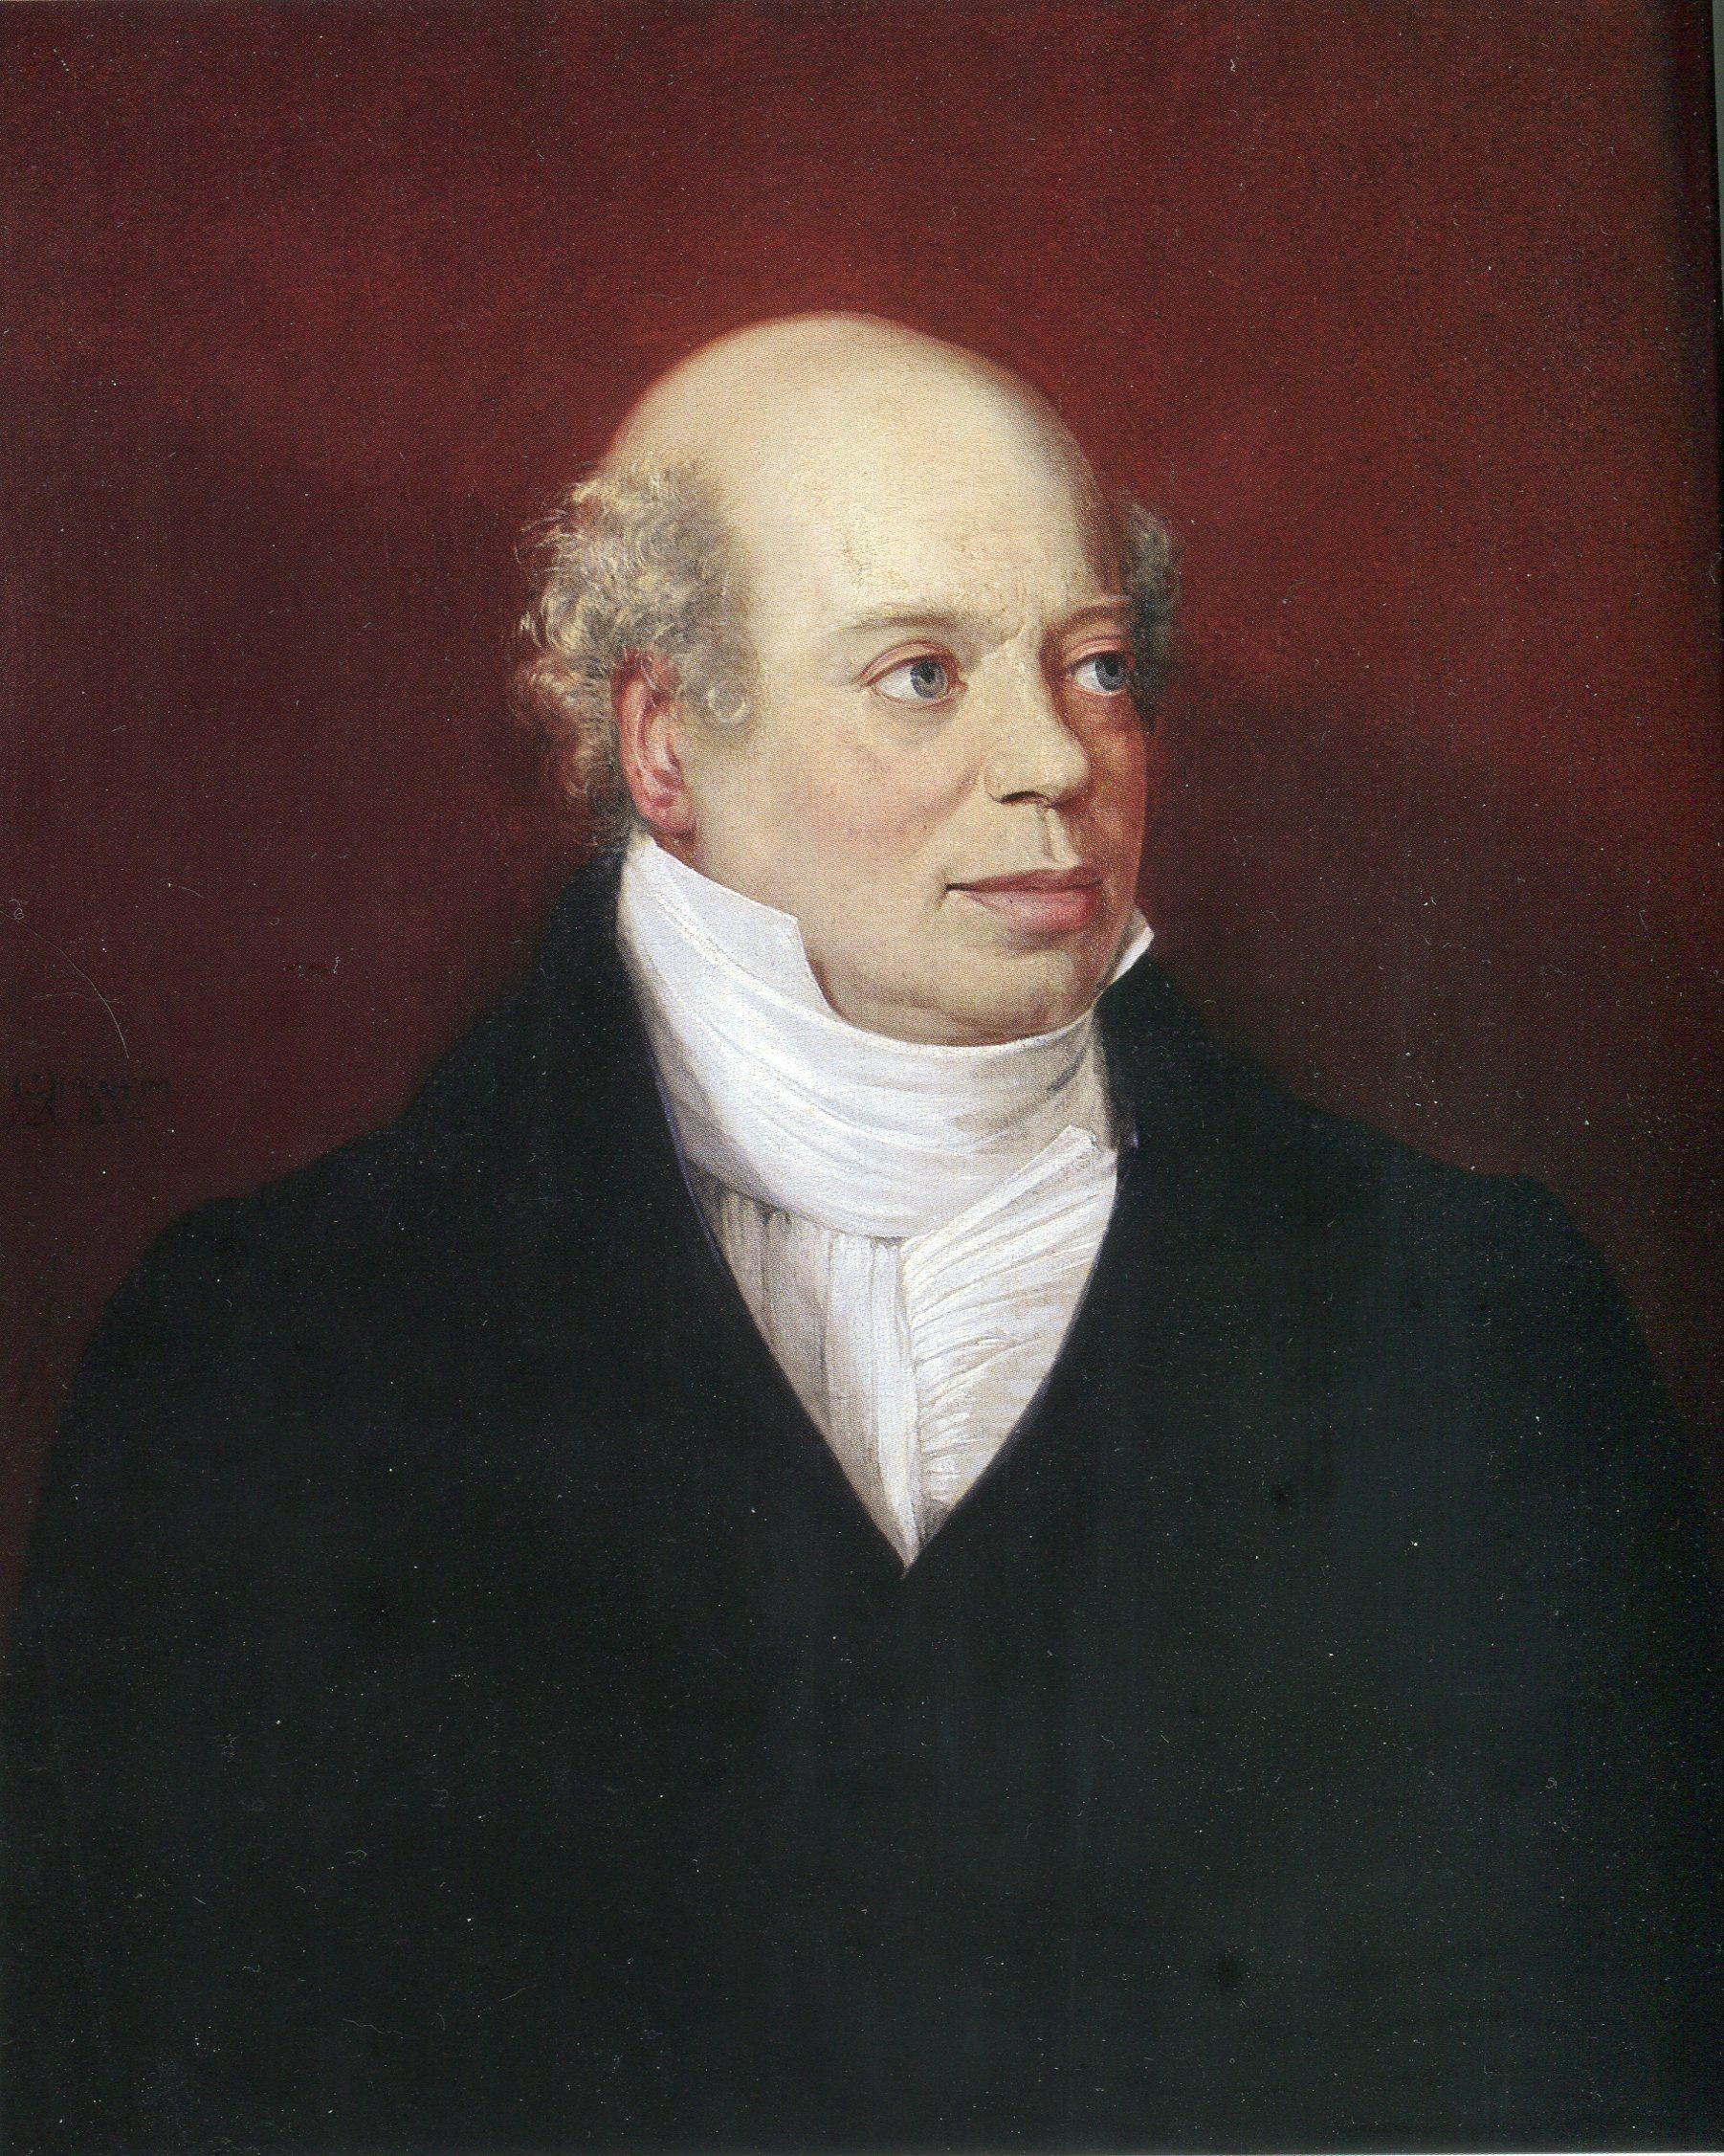 nathan-mayer-rothschild-1853